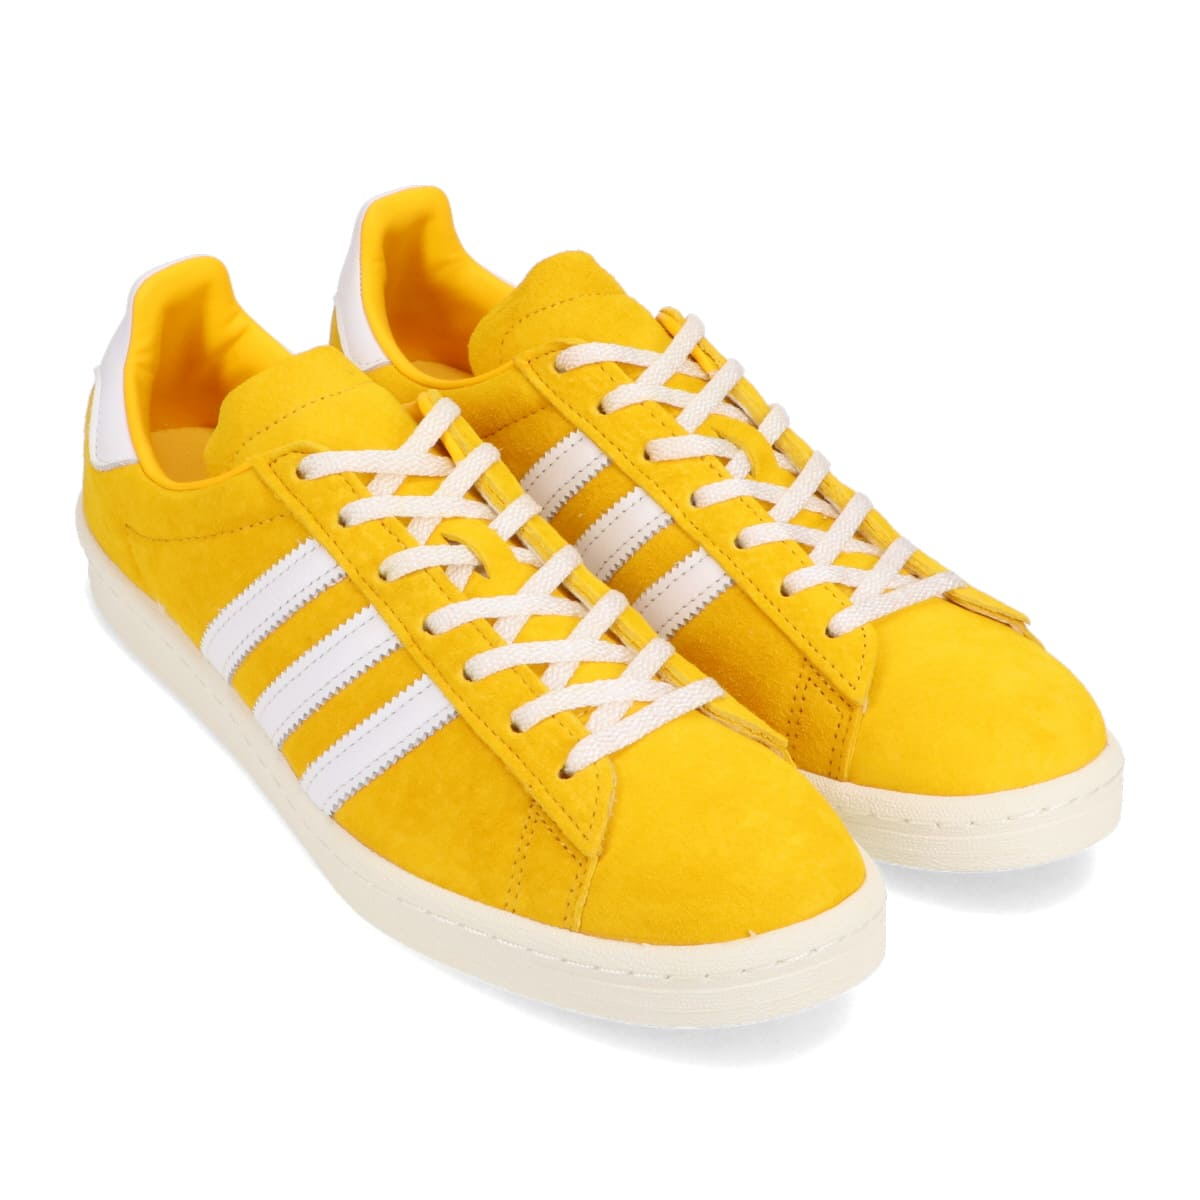 adidas CAMPUS 80s BOLD GOLD/FOOTWEAR